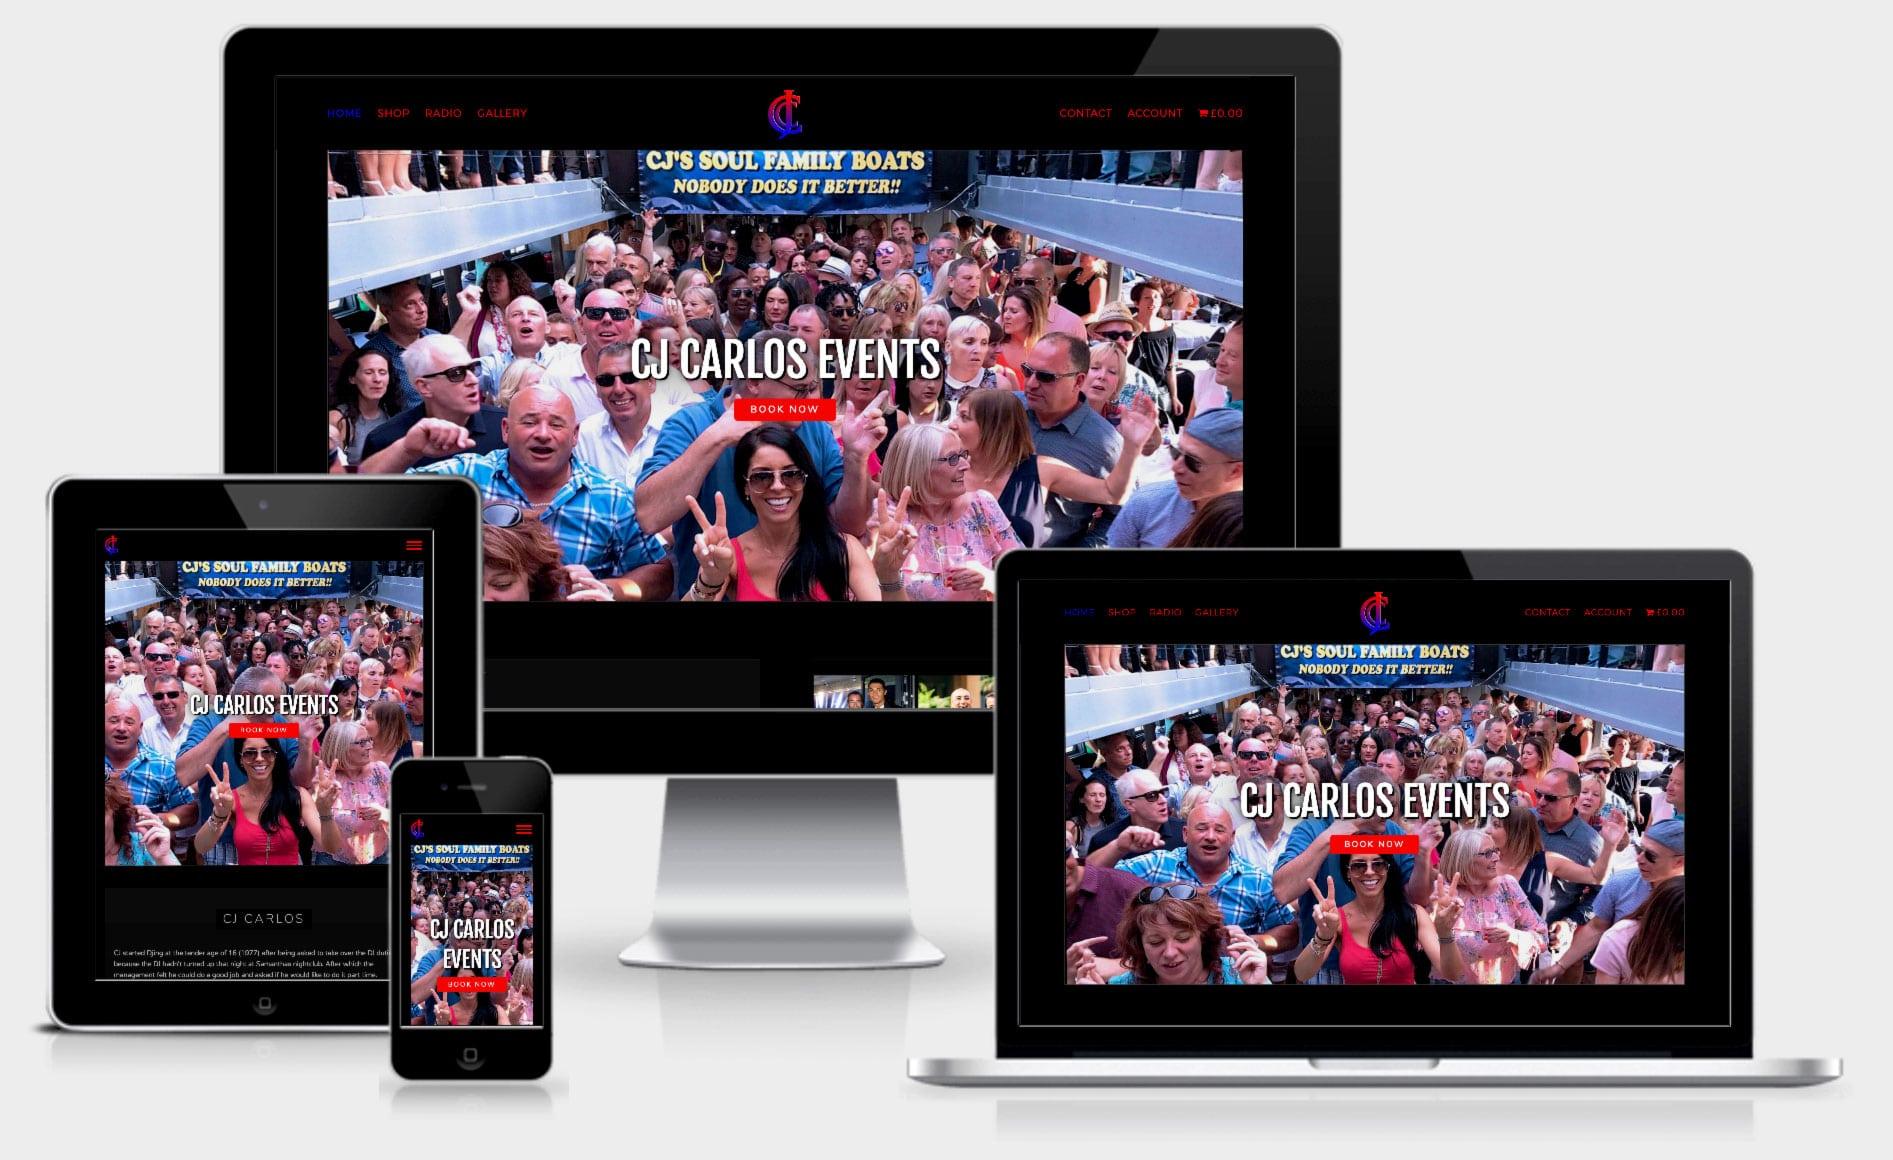 cj-carlos-events-mpower-webdesign-template